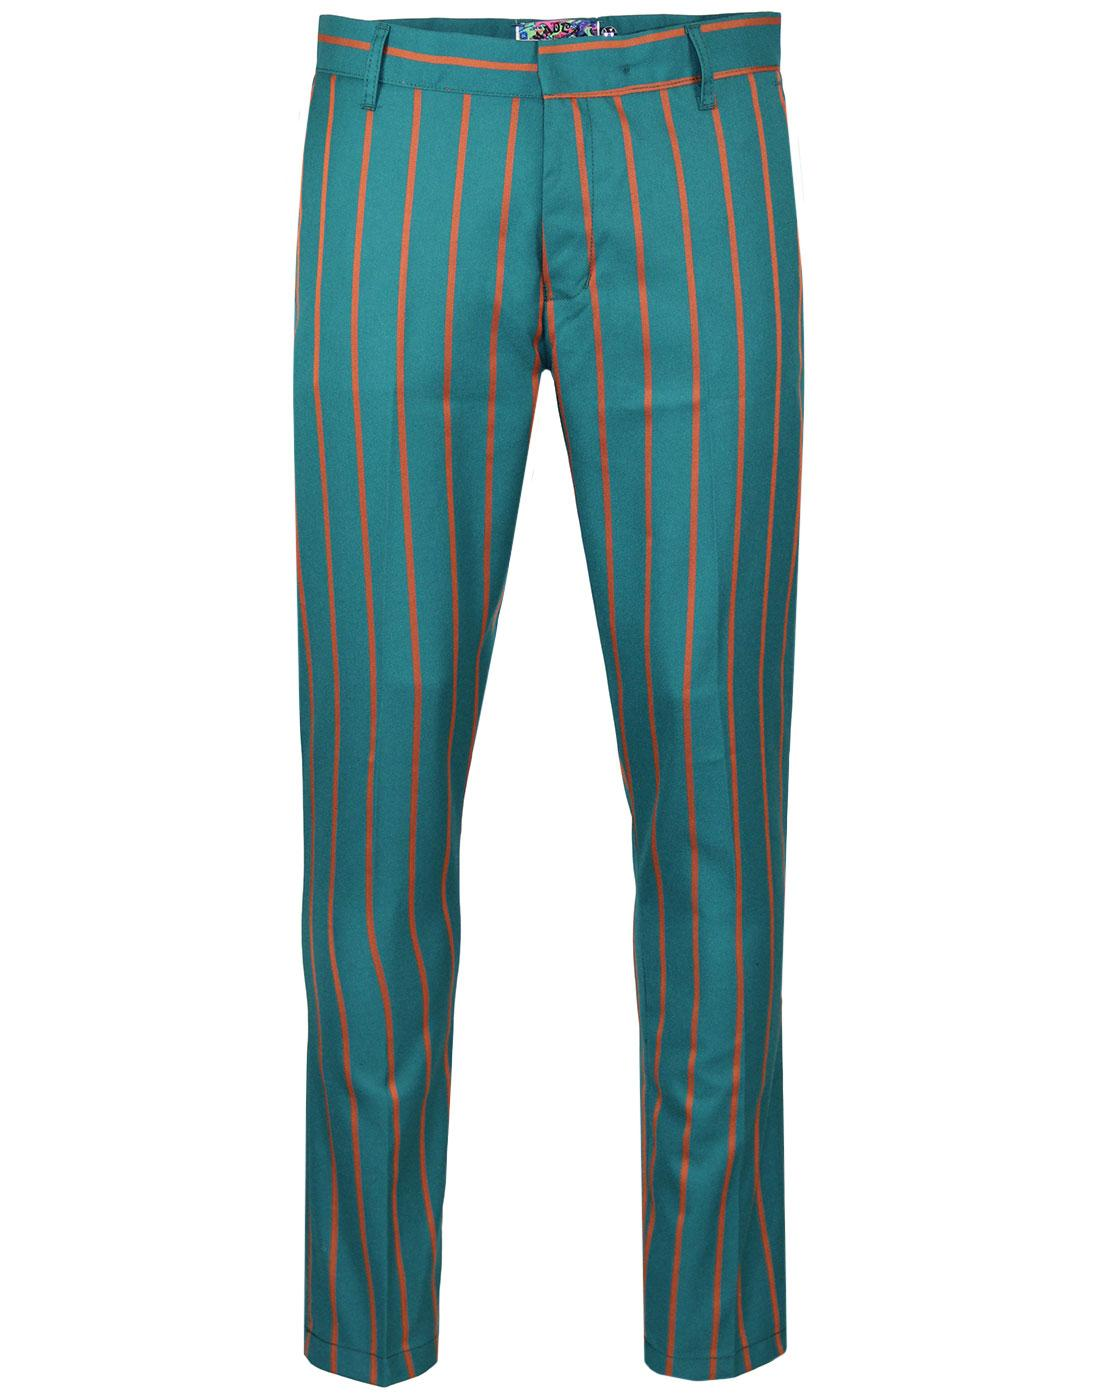 Offbeat MADCAP ENGLAND 60s Mod Stripe Trousers T/J